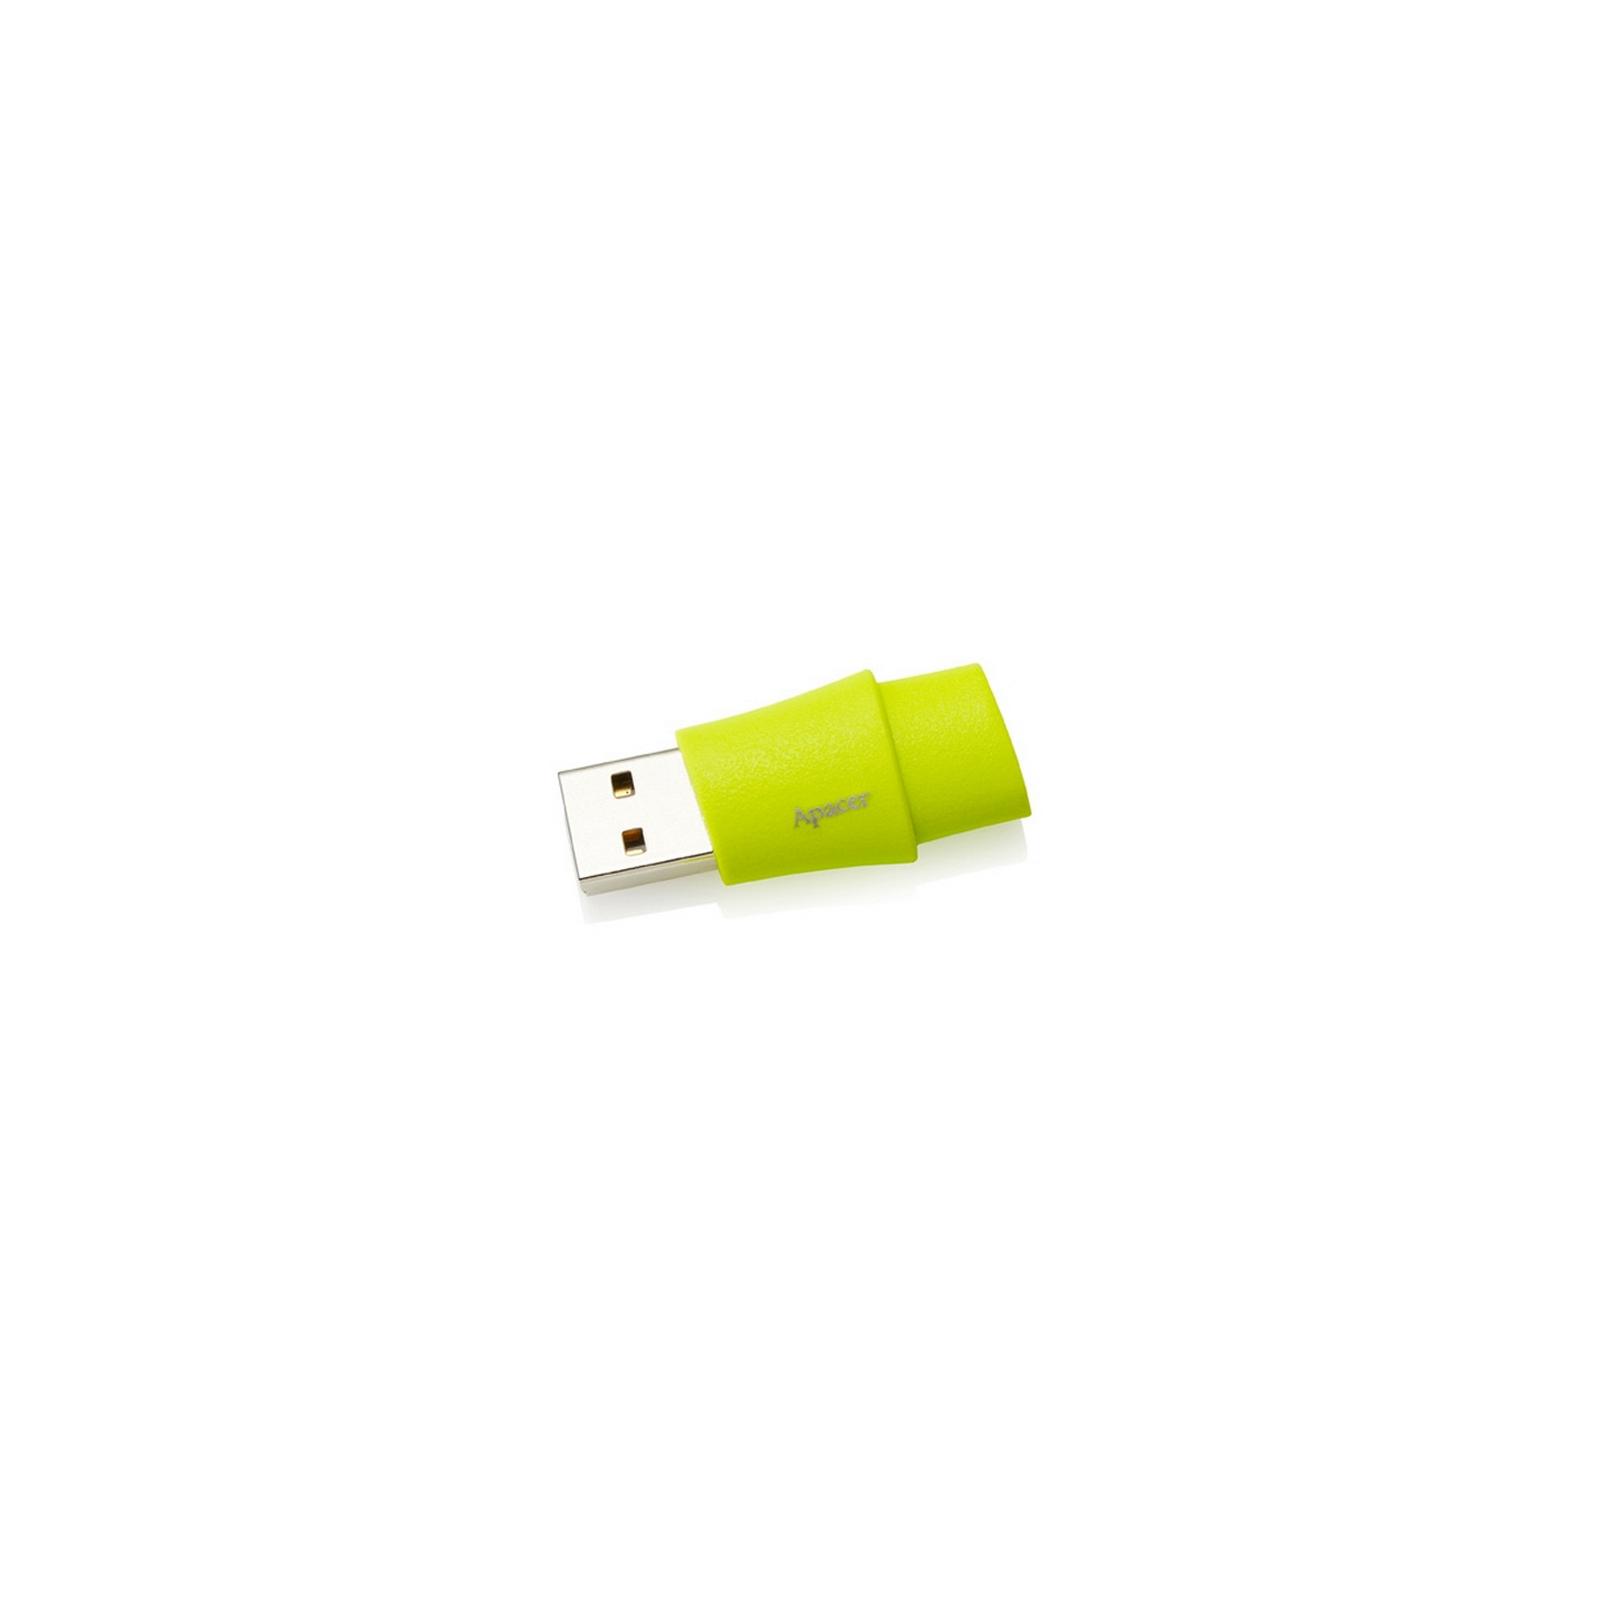 USB флеш накопитель 8GB AH137 Green RP USB2.0 Apacer (AP8GAH137G-1) изображение 2